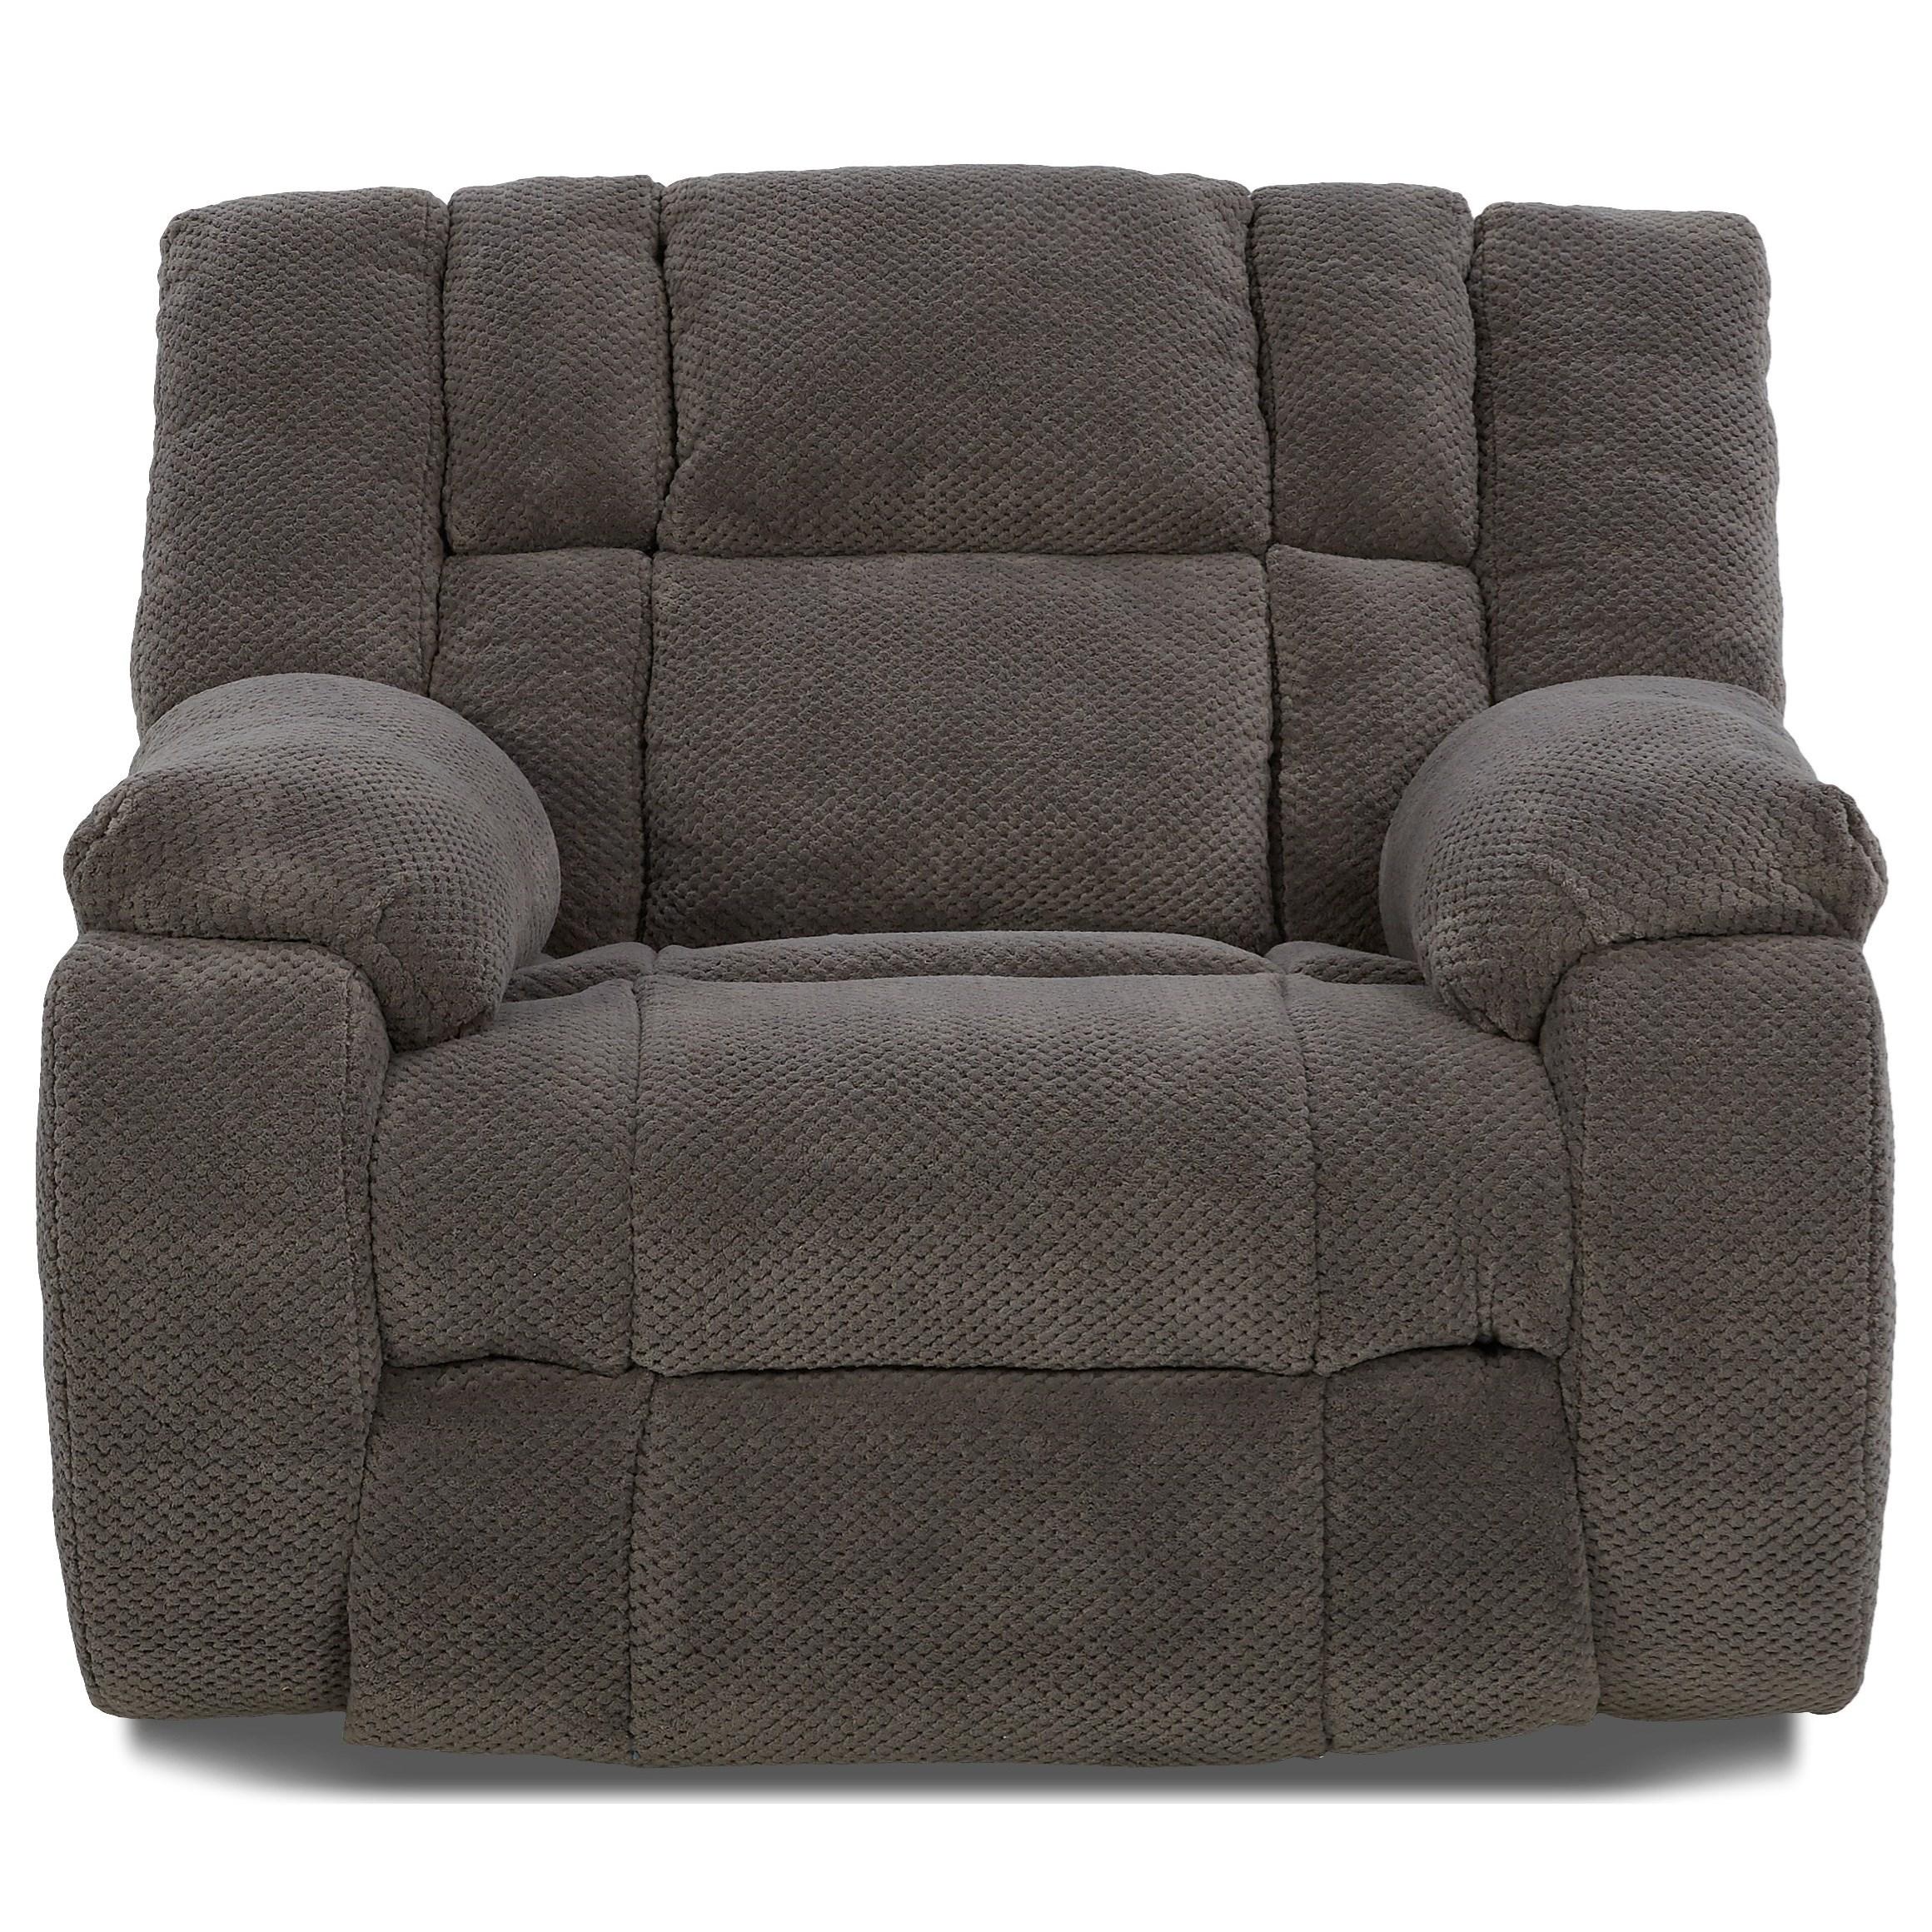 Dozer Reclining Big Chair